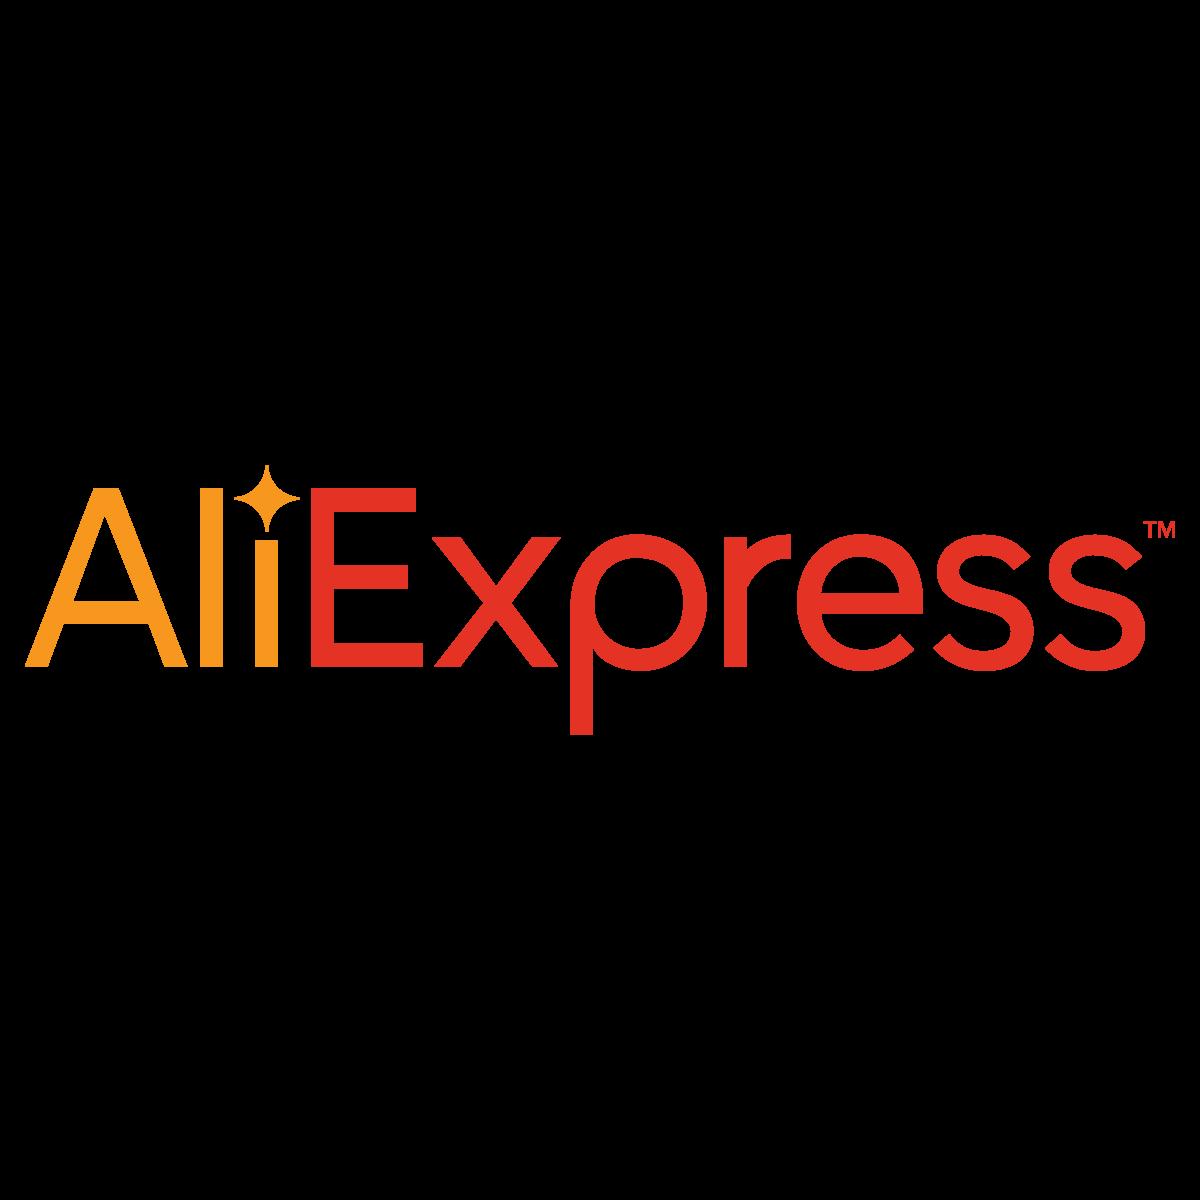 aliexpress-logo-vector.png